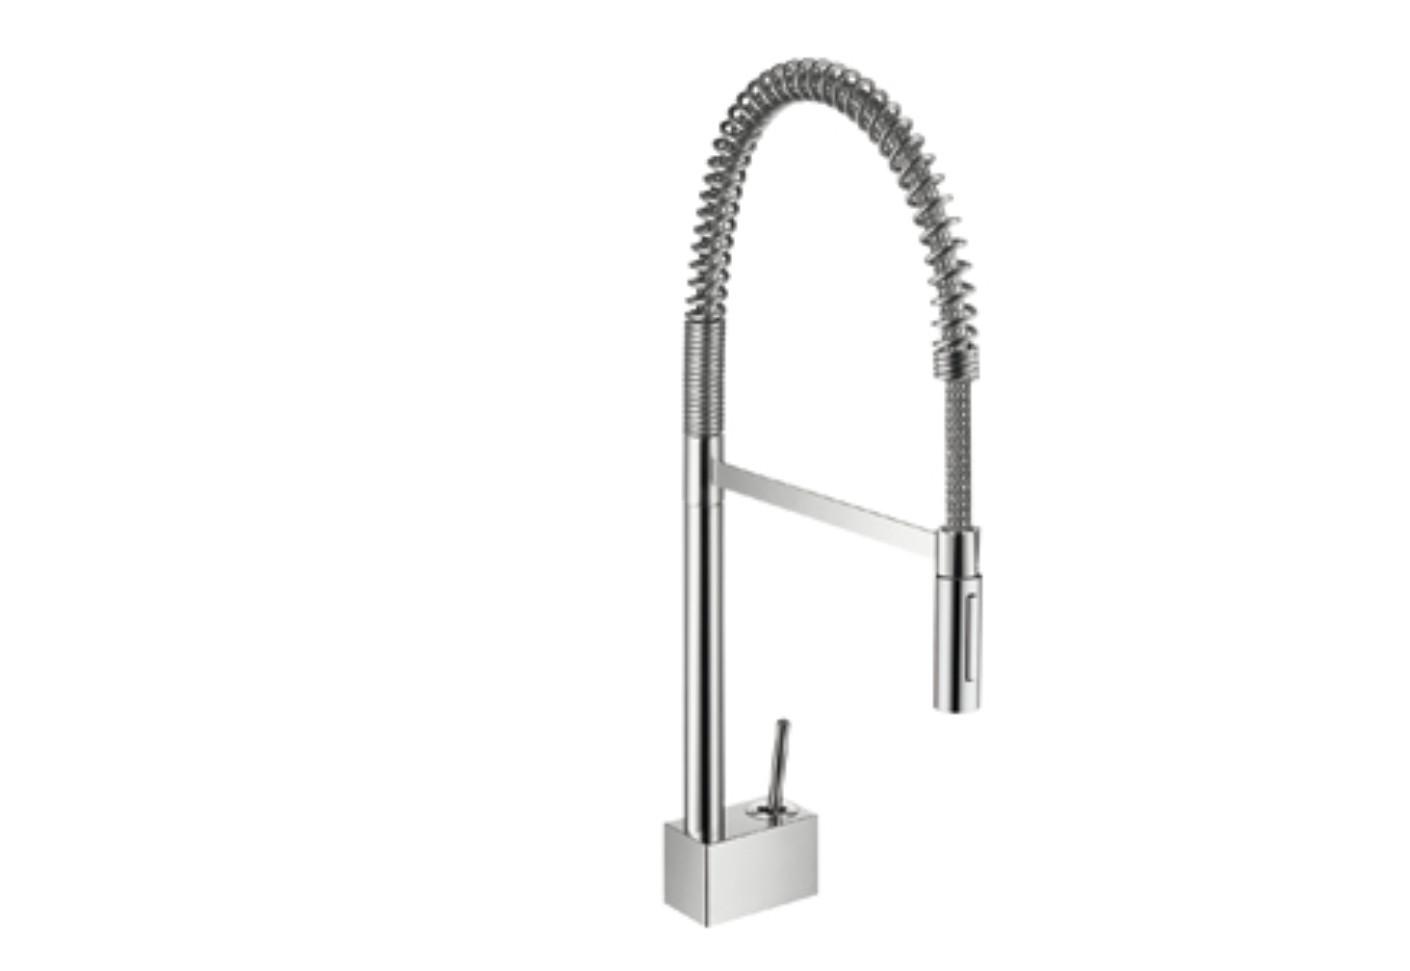 Axor Starck Semi-Pro Single Lever Kitchen Mixer DN15 by Axor | STYLEPARK